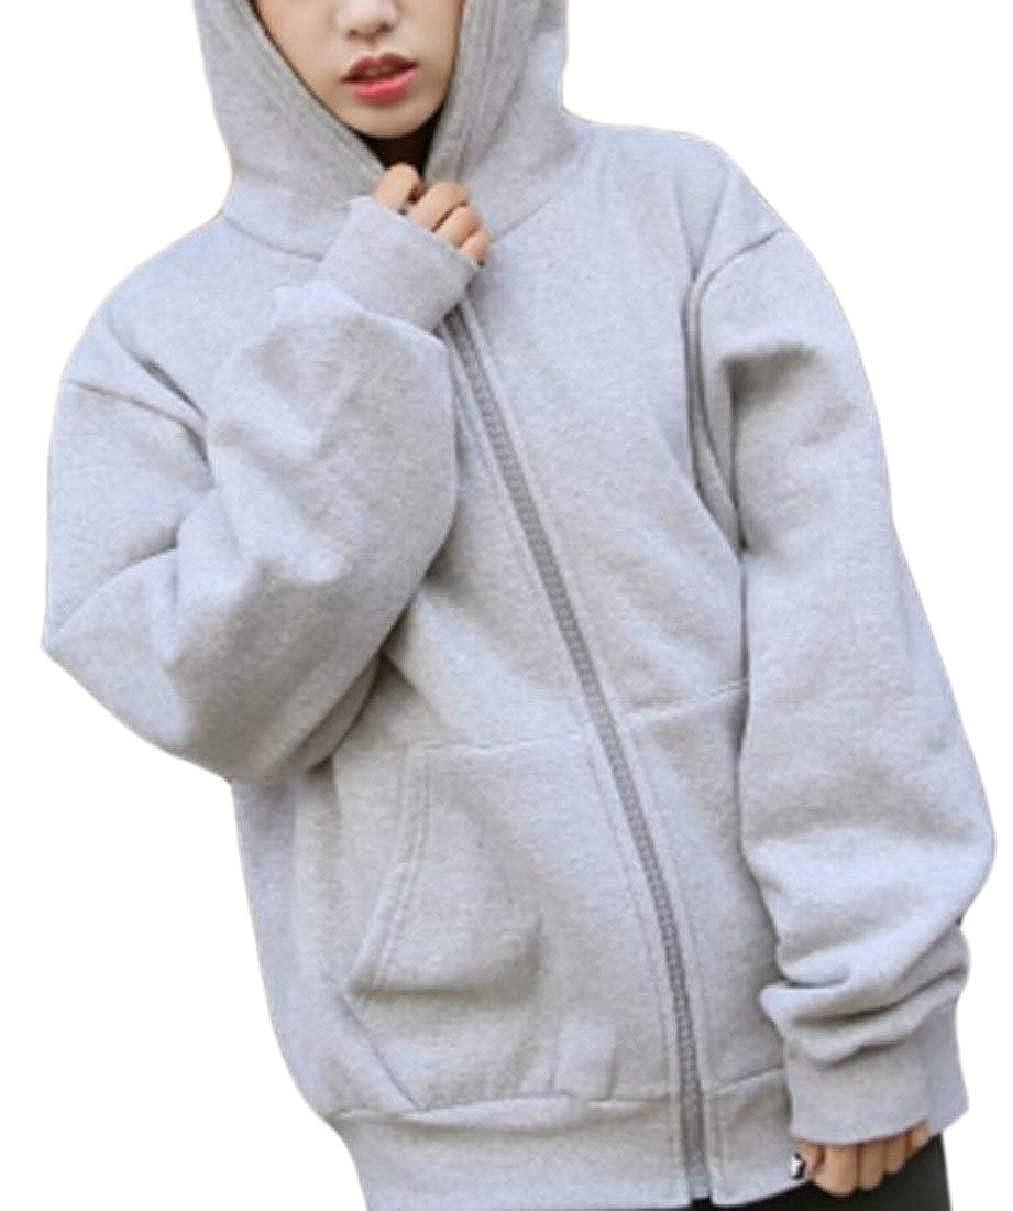 LEISHOP Womens Thermal Hood Plain Relaxed Kangaroo Pocket Fleece Sweatshirt Coat